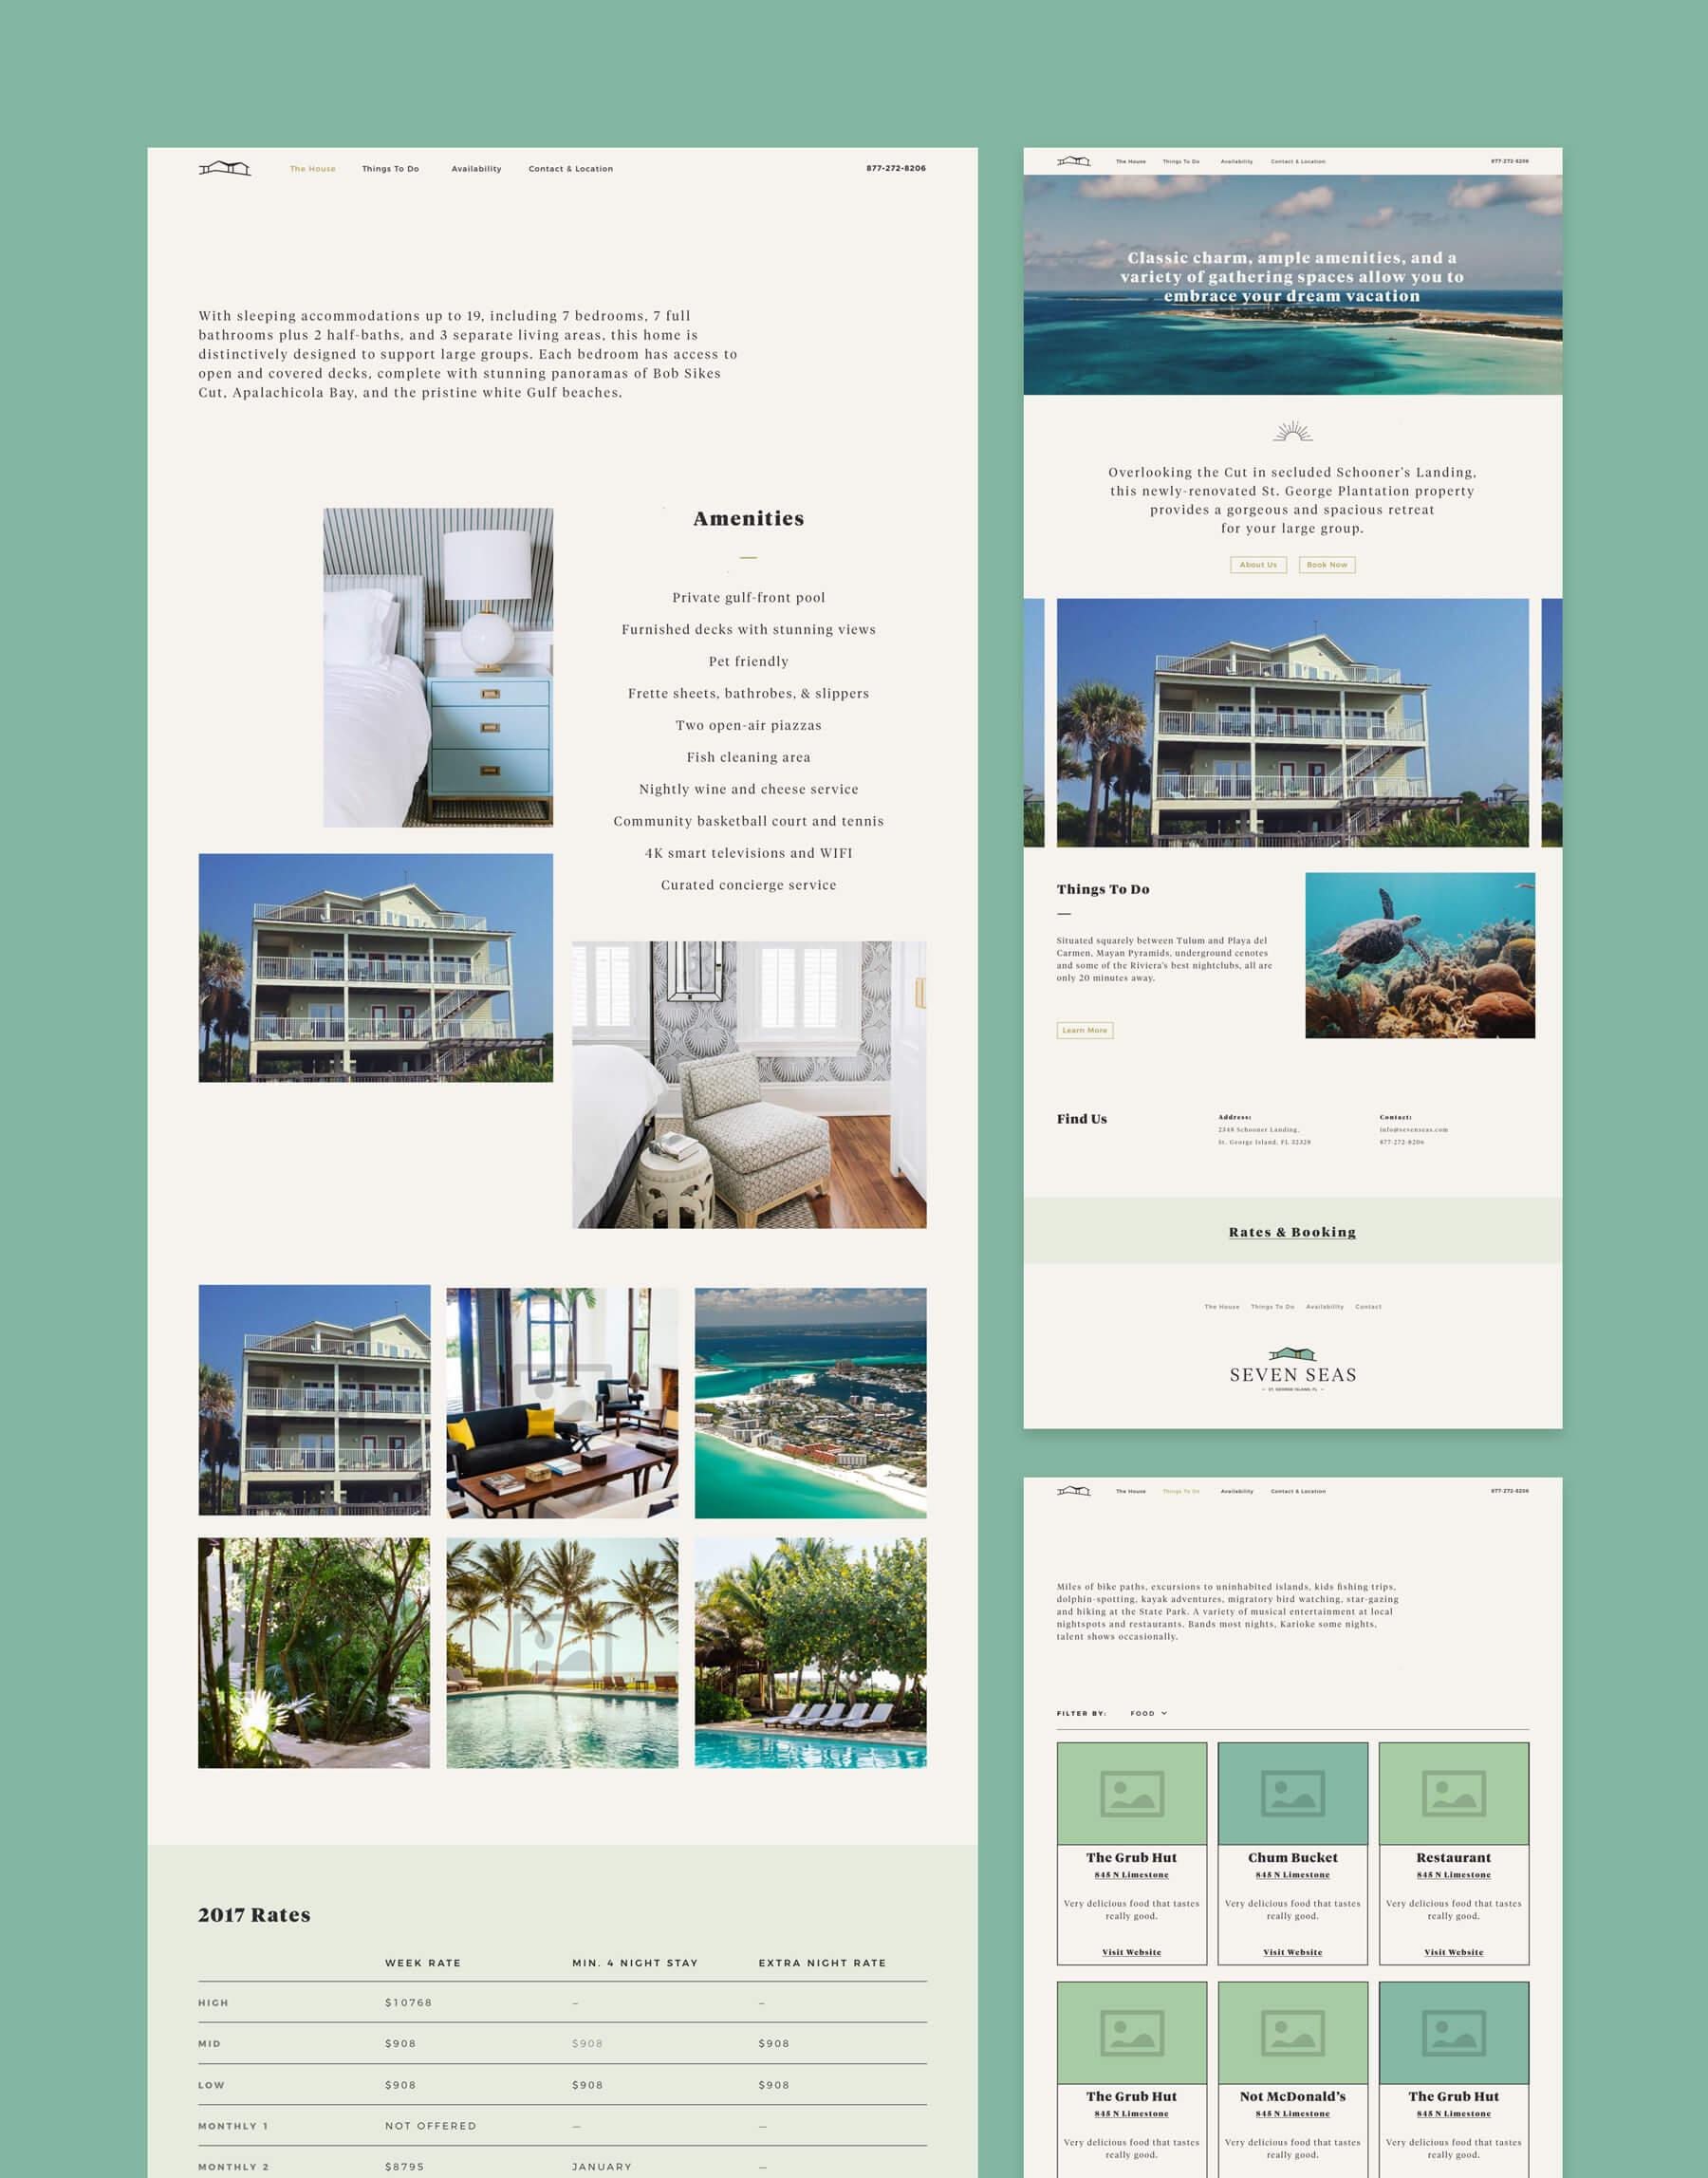 sevenseas-website